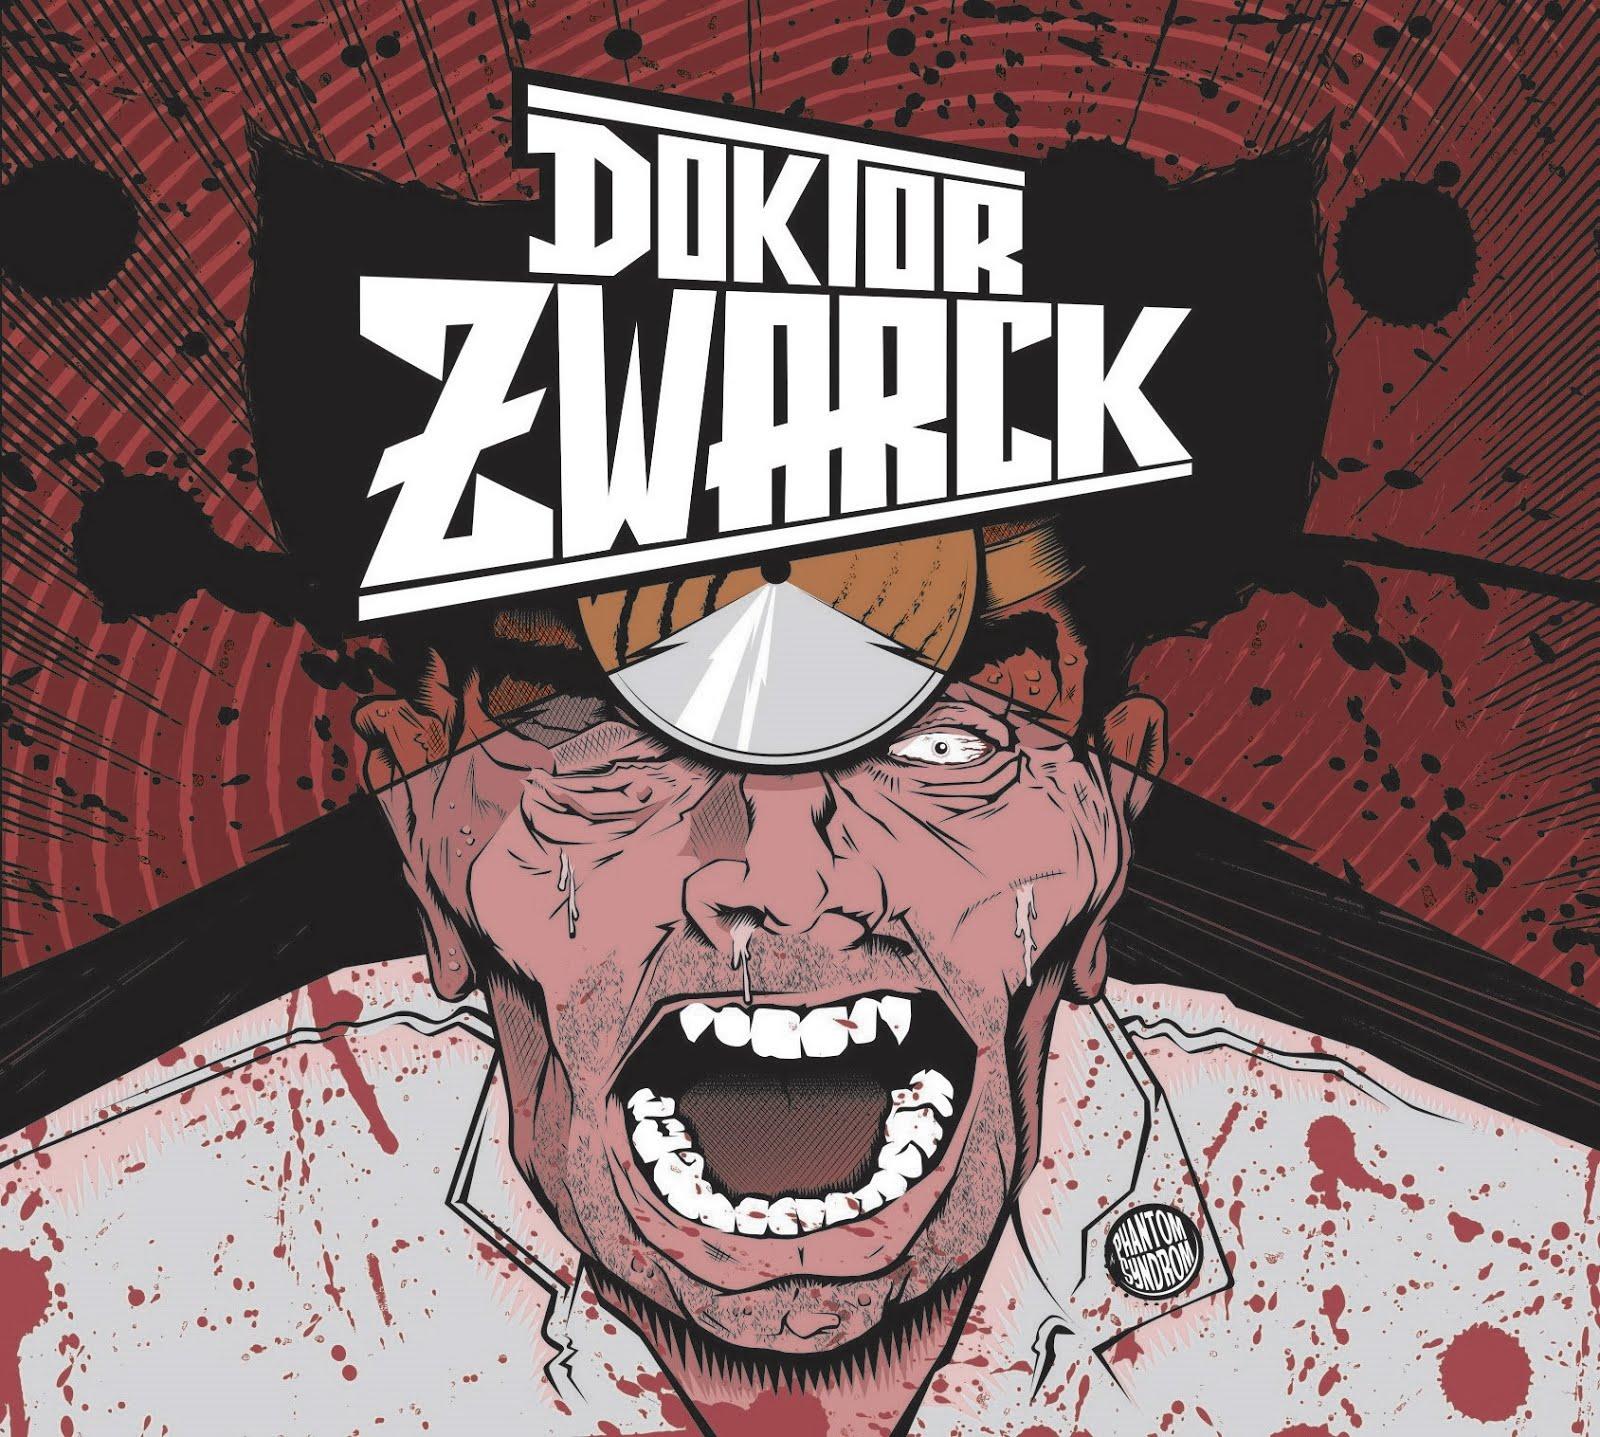 DOKTOR ZWARCK